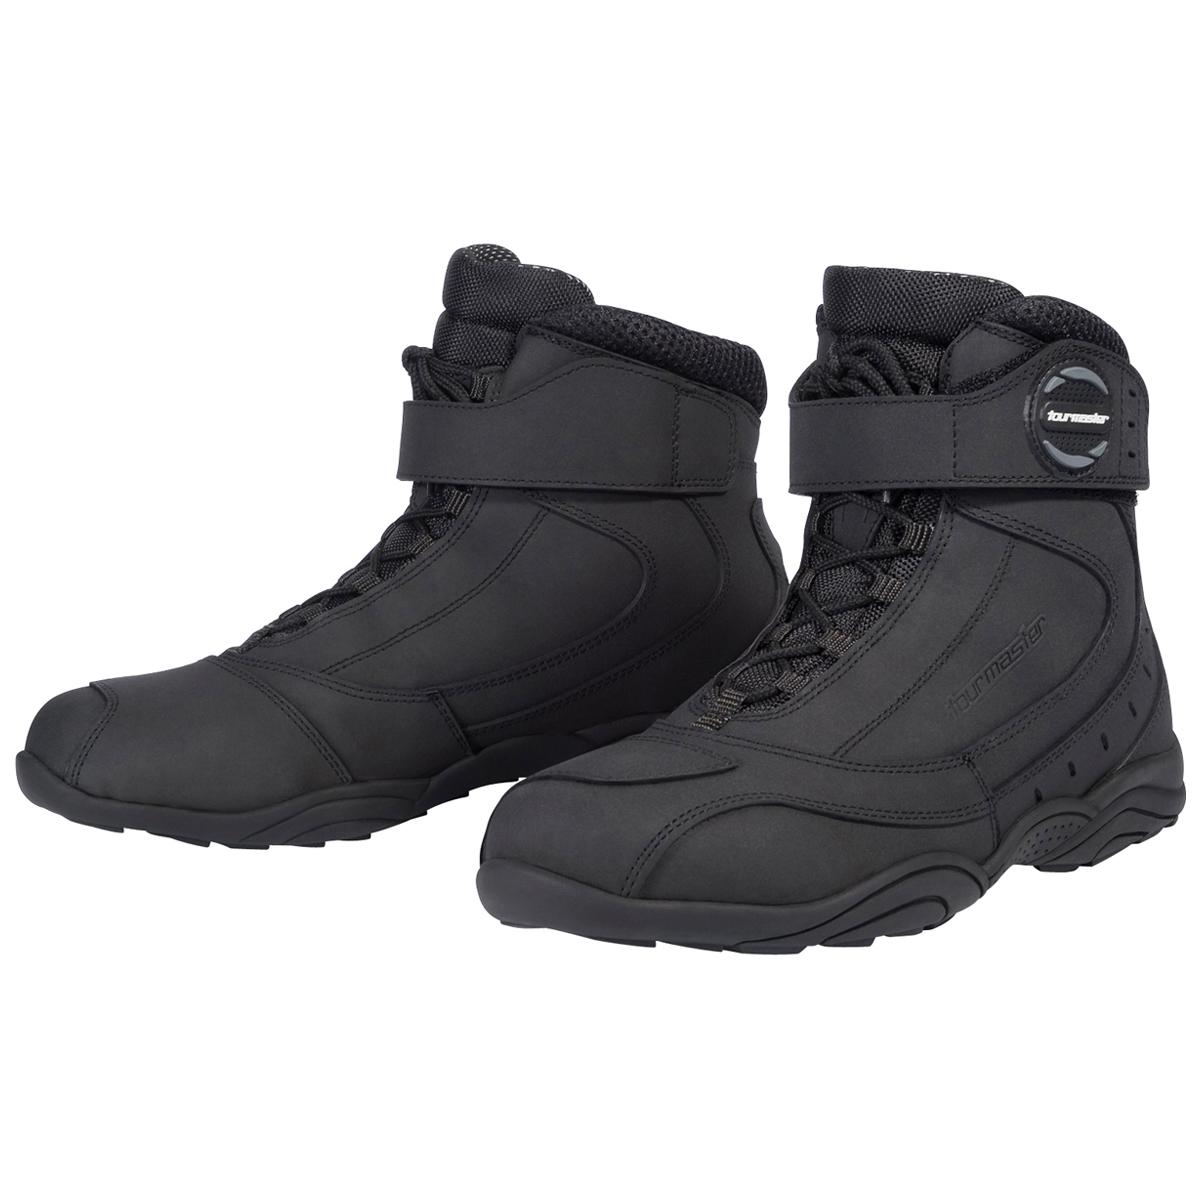 ... tour master response 2.0 waterproof boots ... HUMZIOD